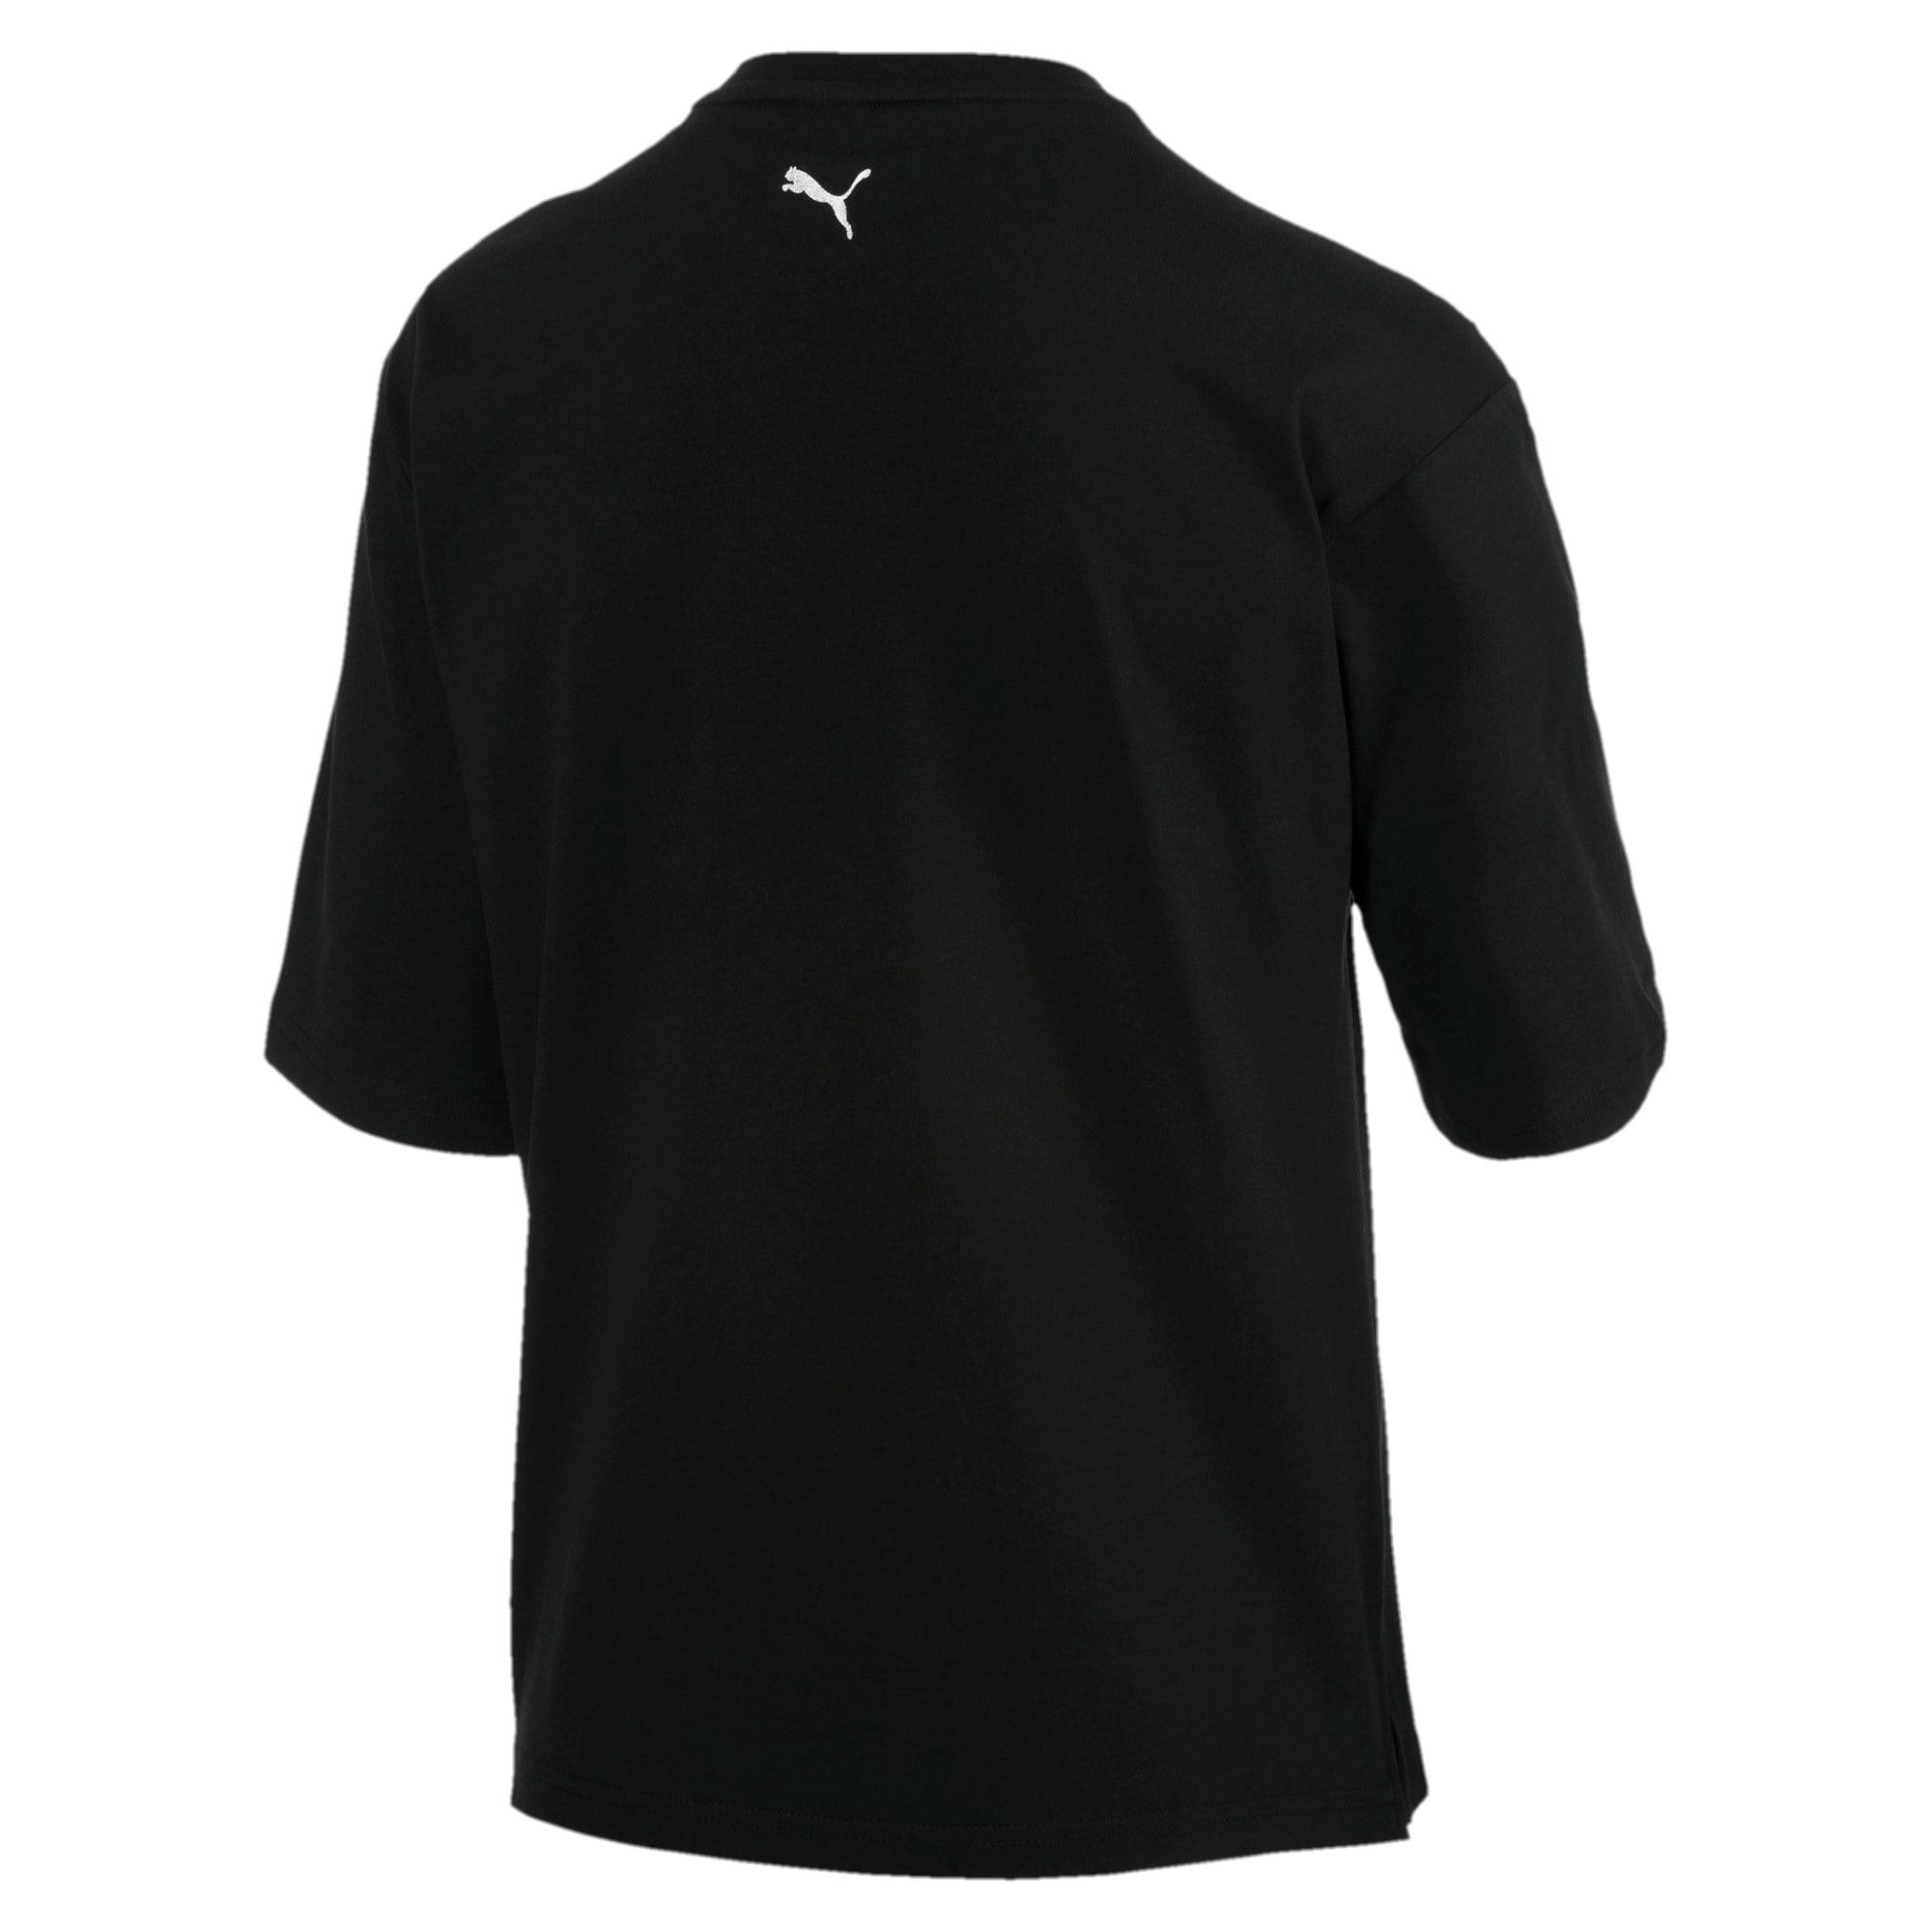 Miniatura 4 de Camiseta Trailblazer para mujer, Cotton Black, mediano